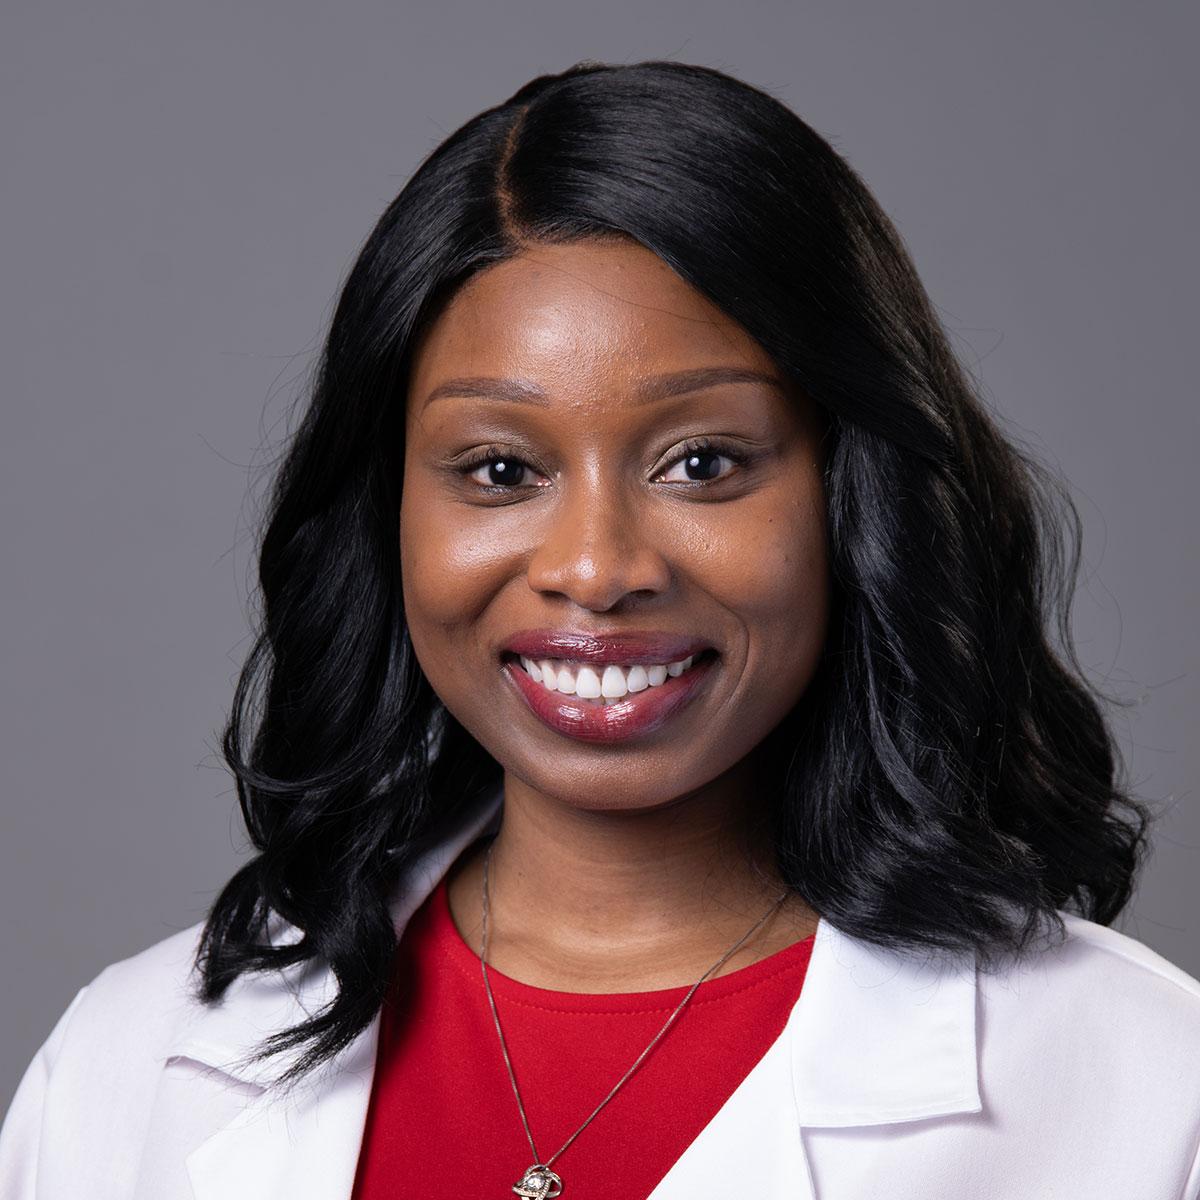 A friendly headshot of Dr. Ashley Aisabor